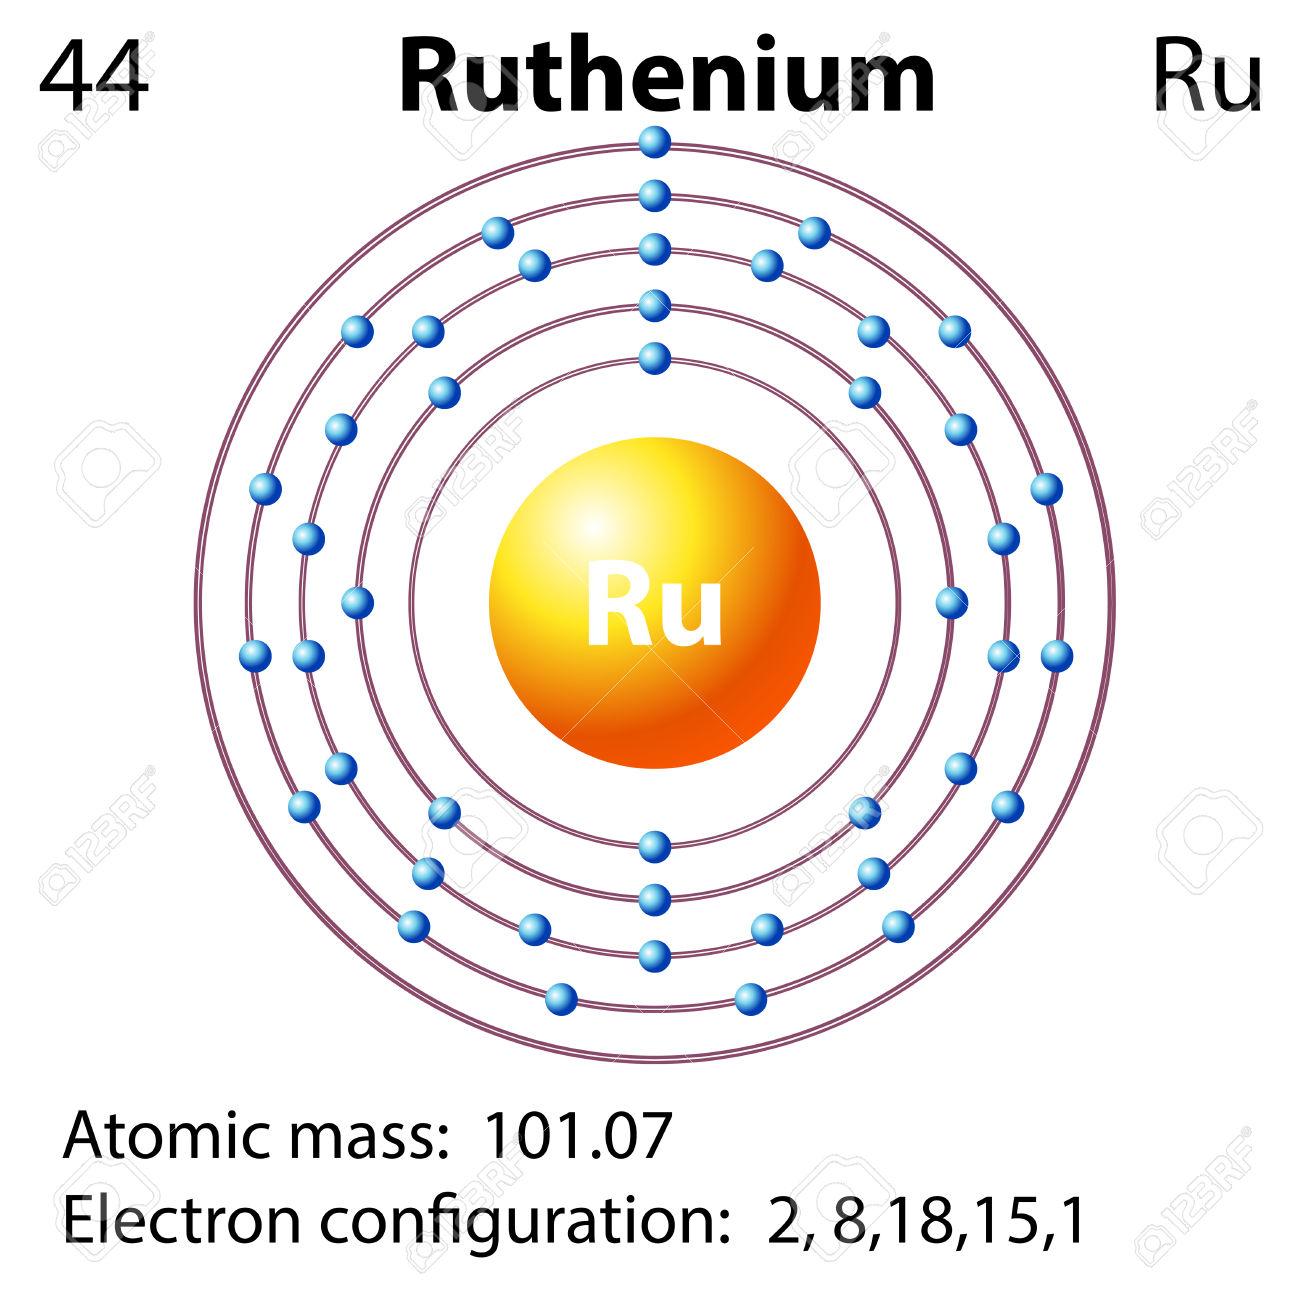 Ruthenium clipart #1, Download drawings